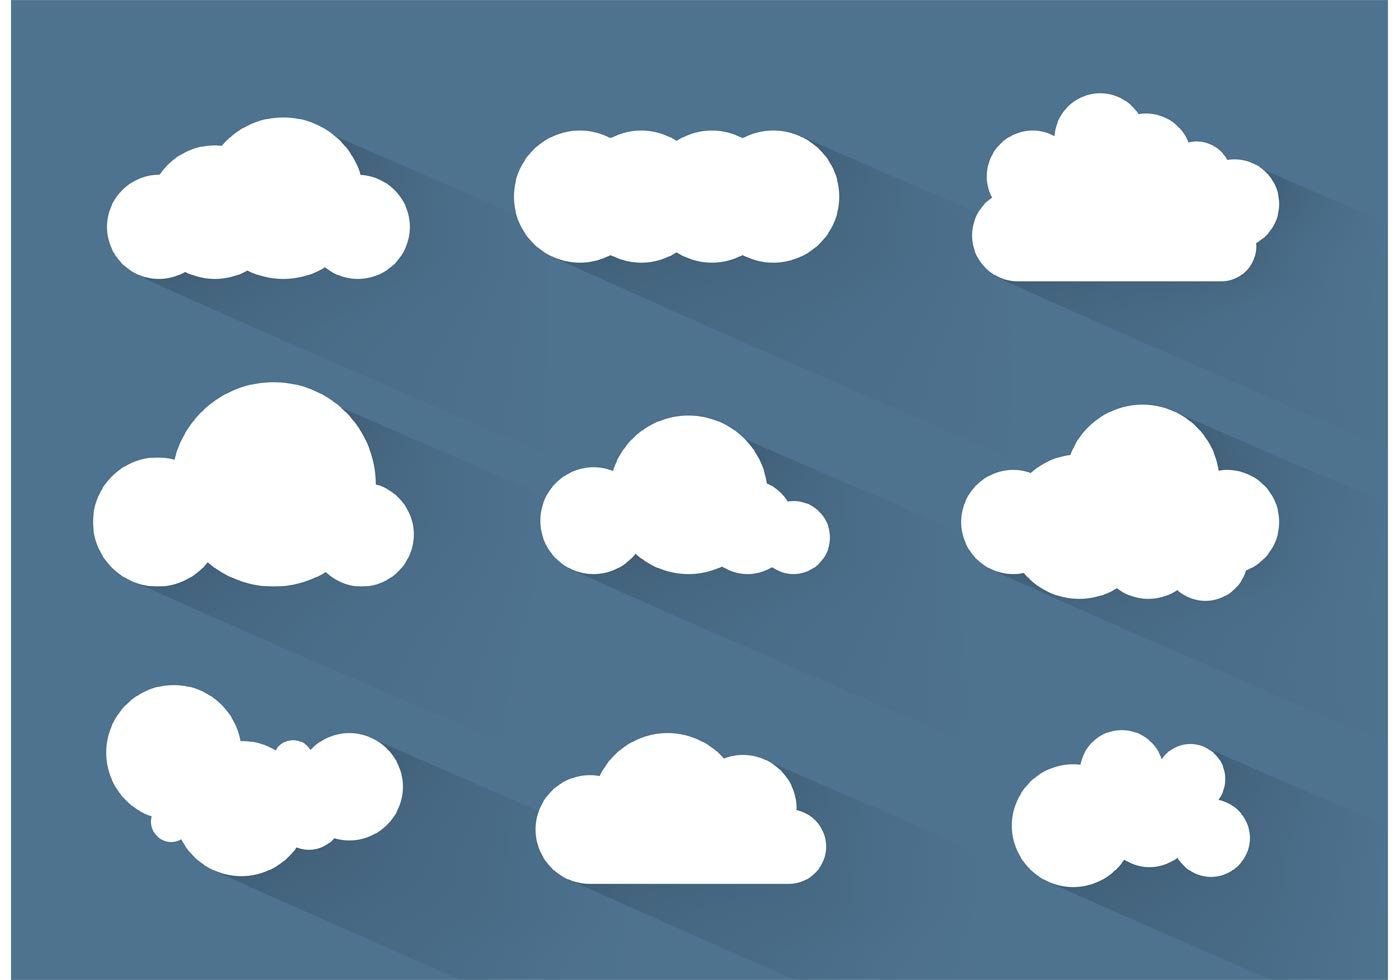 simpe cloud vectors download free vector art stock graphics images rh vecteezy com cloud vectors free cloud vector art